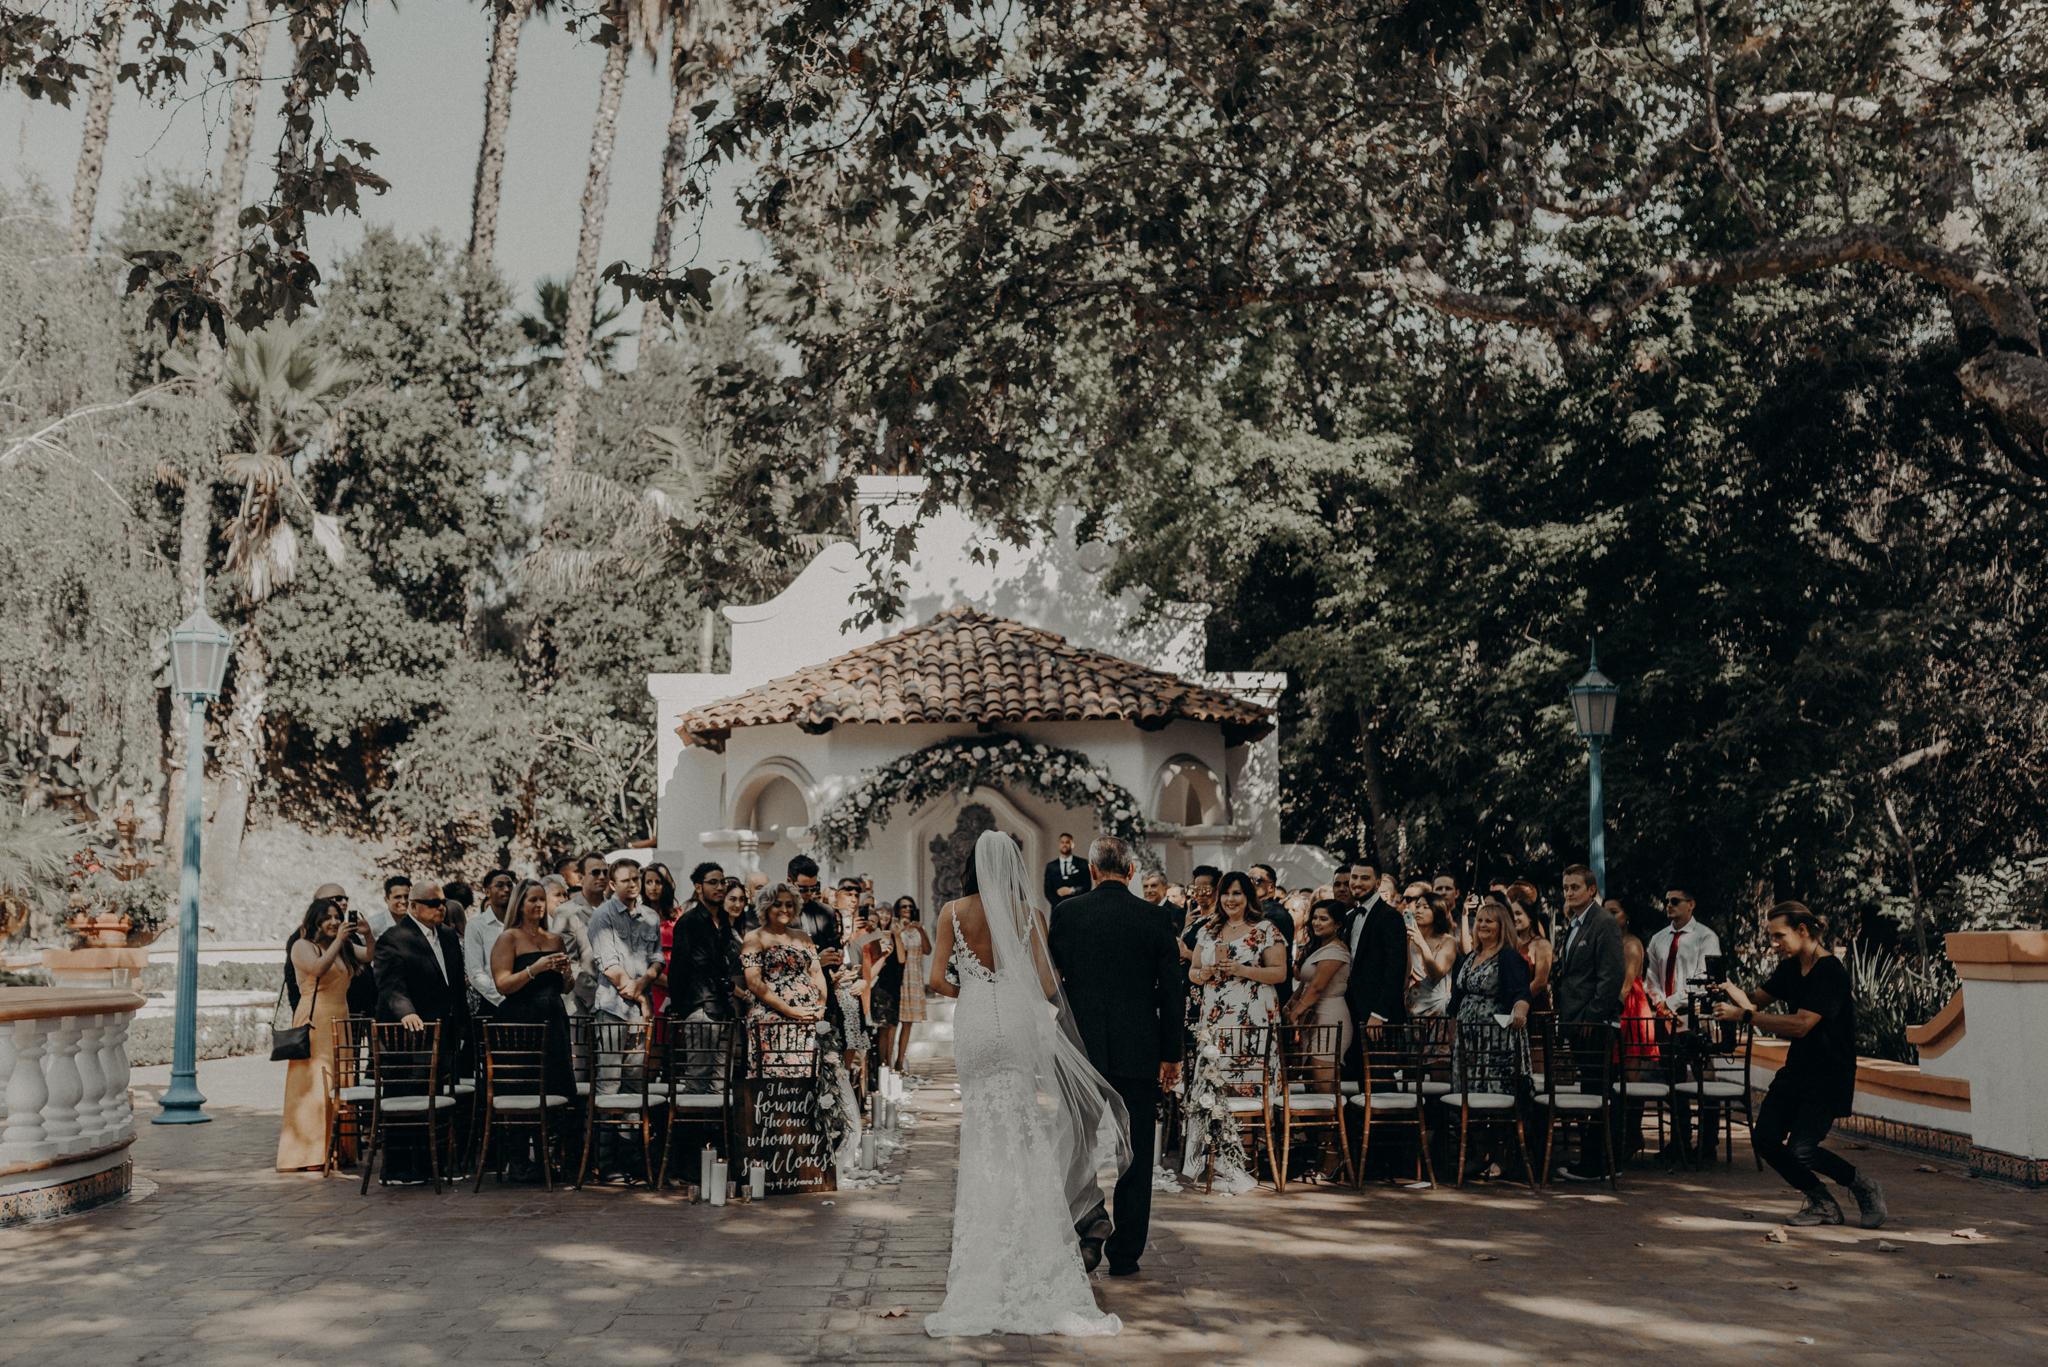 Isaiah + Taylor Photography - Rancho Las Lomas Wedding, Los Angeles Wedding Photographer-046.jpg